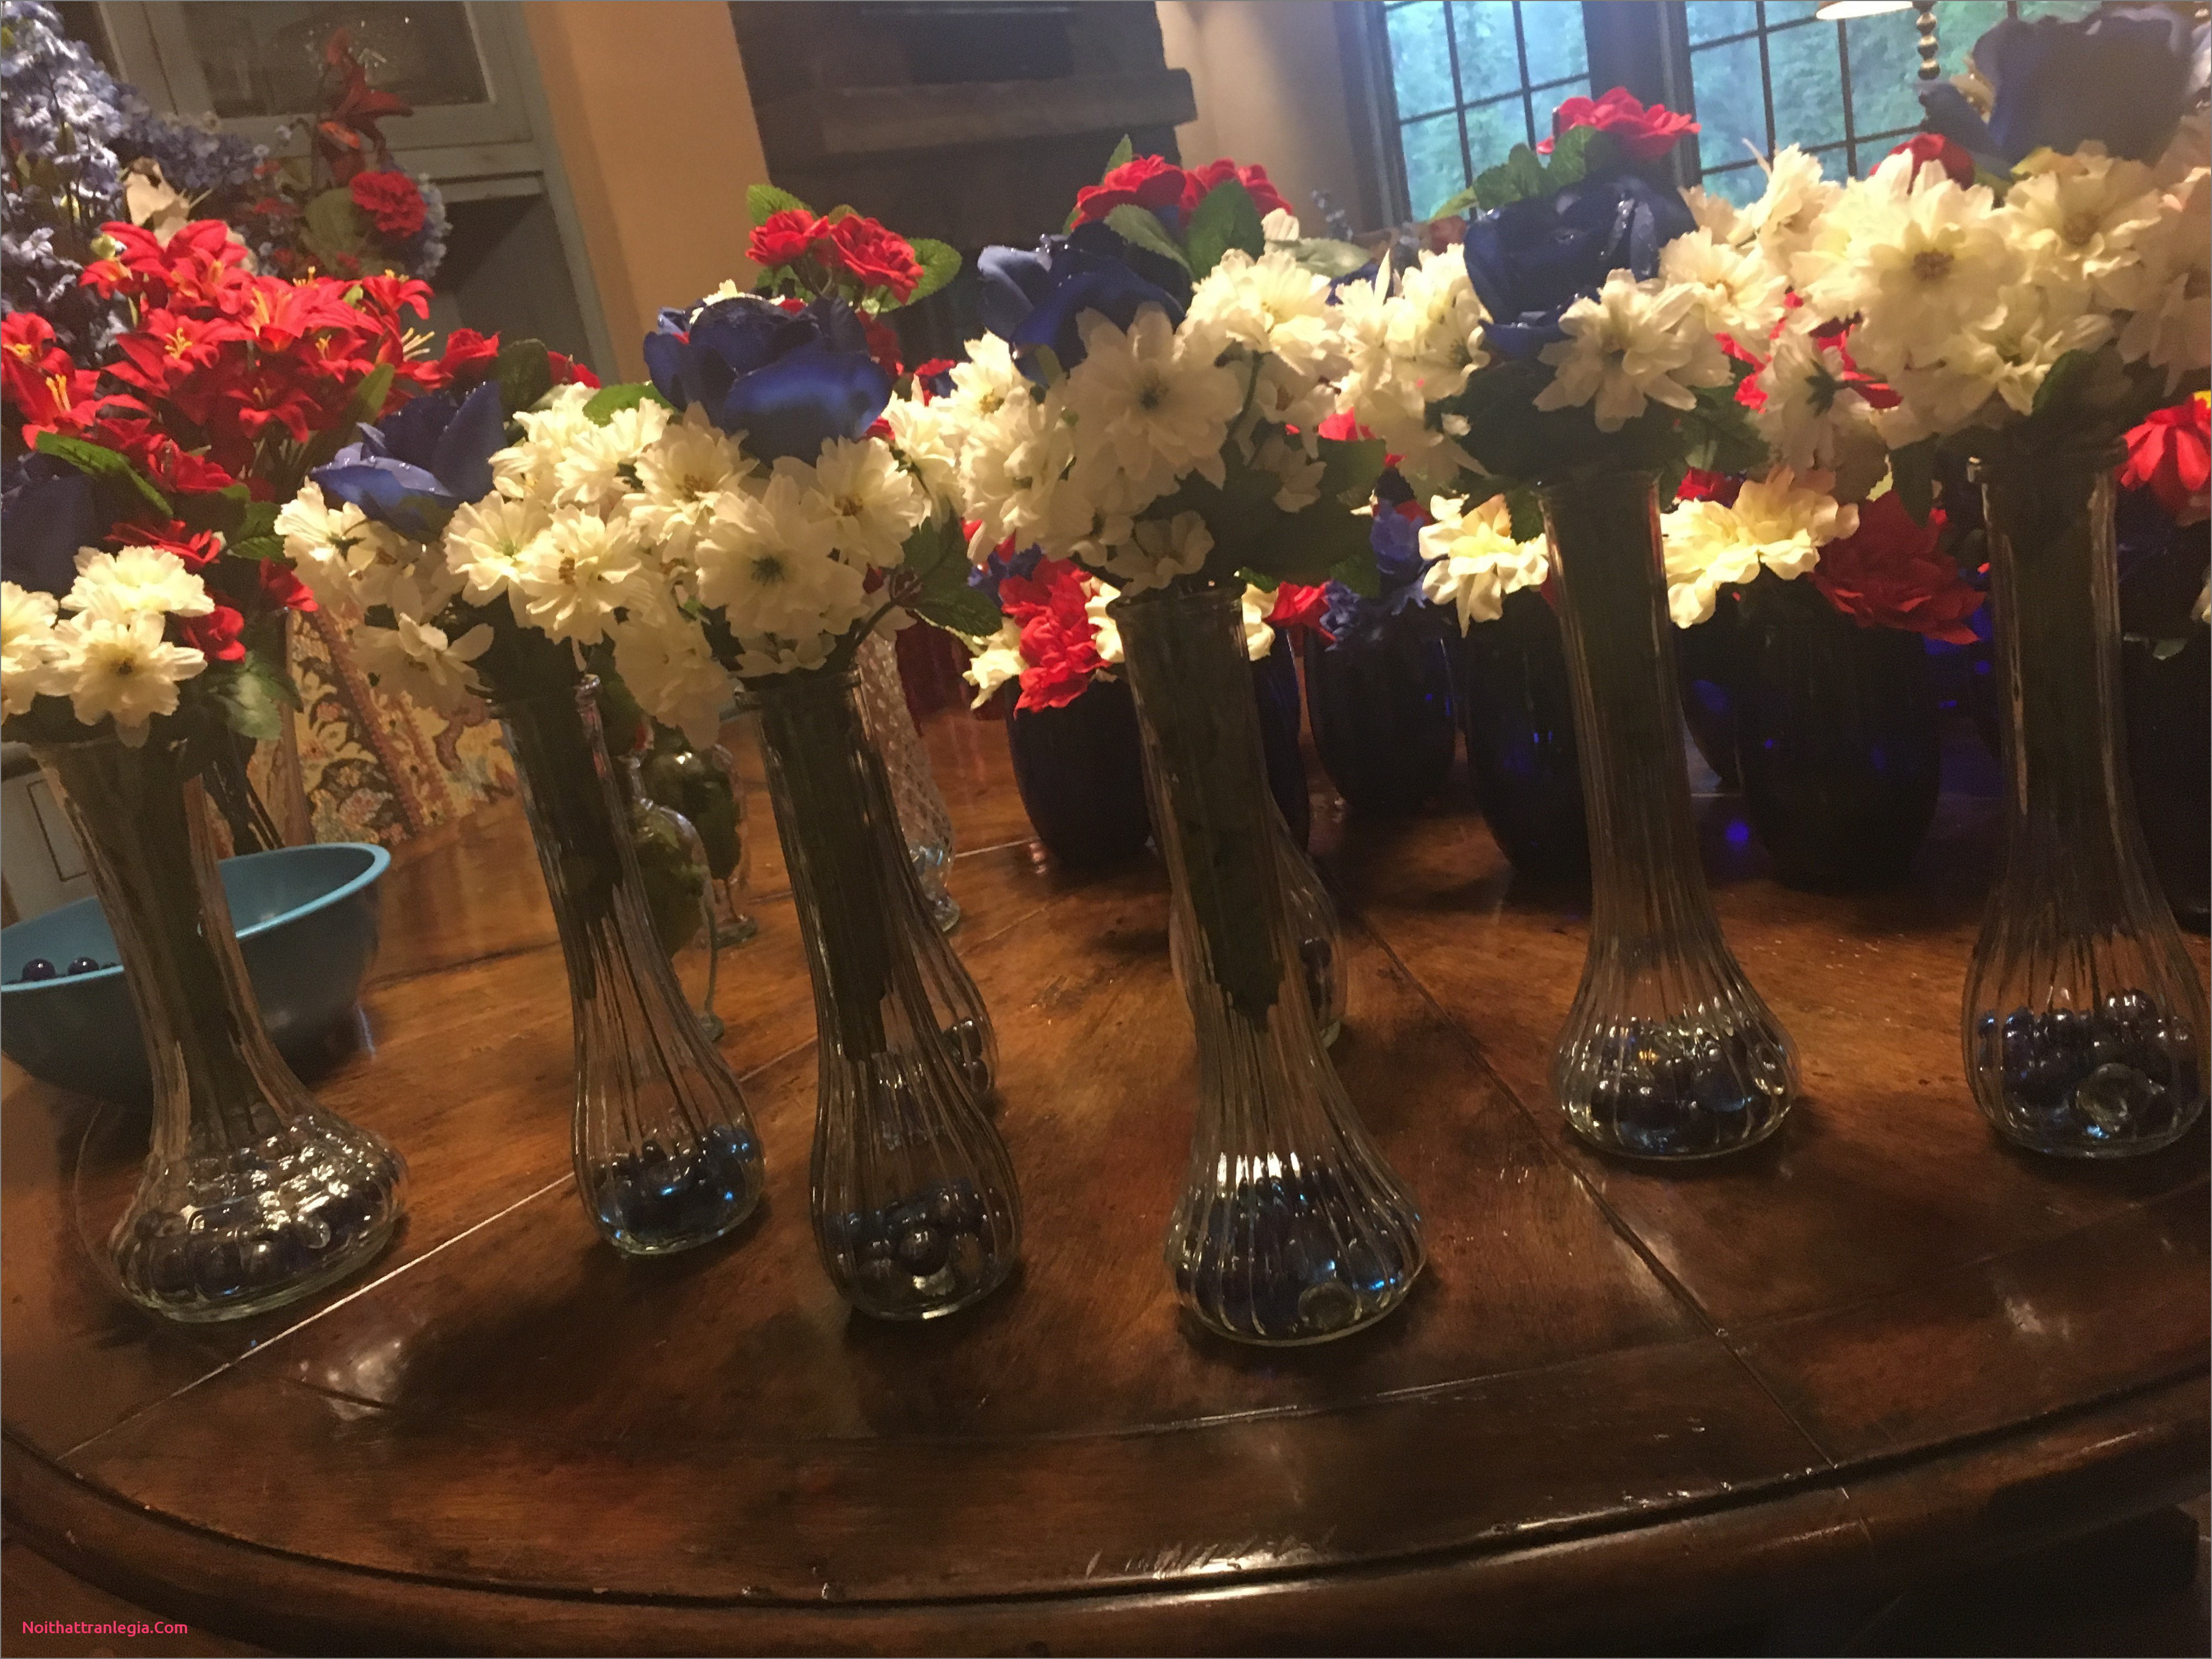 very large floor vases of 20 wedding vases noithattranlegia vases design pertaining to decoration line luxury dollar tree wedding decorations awesome h vases dollar vase i 0d